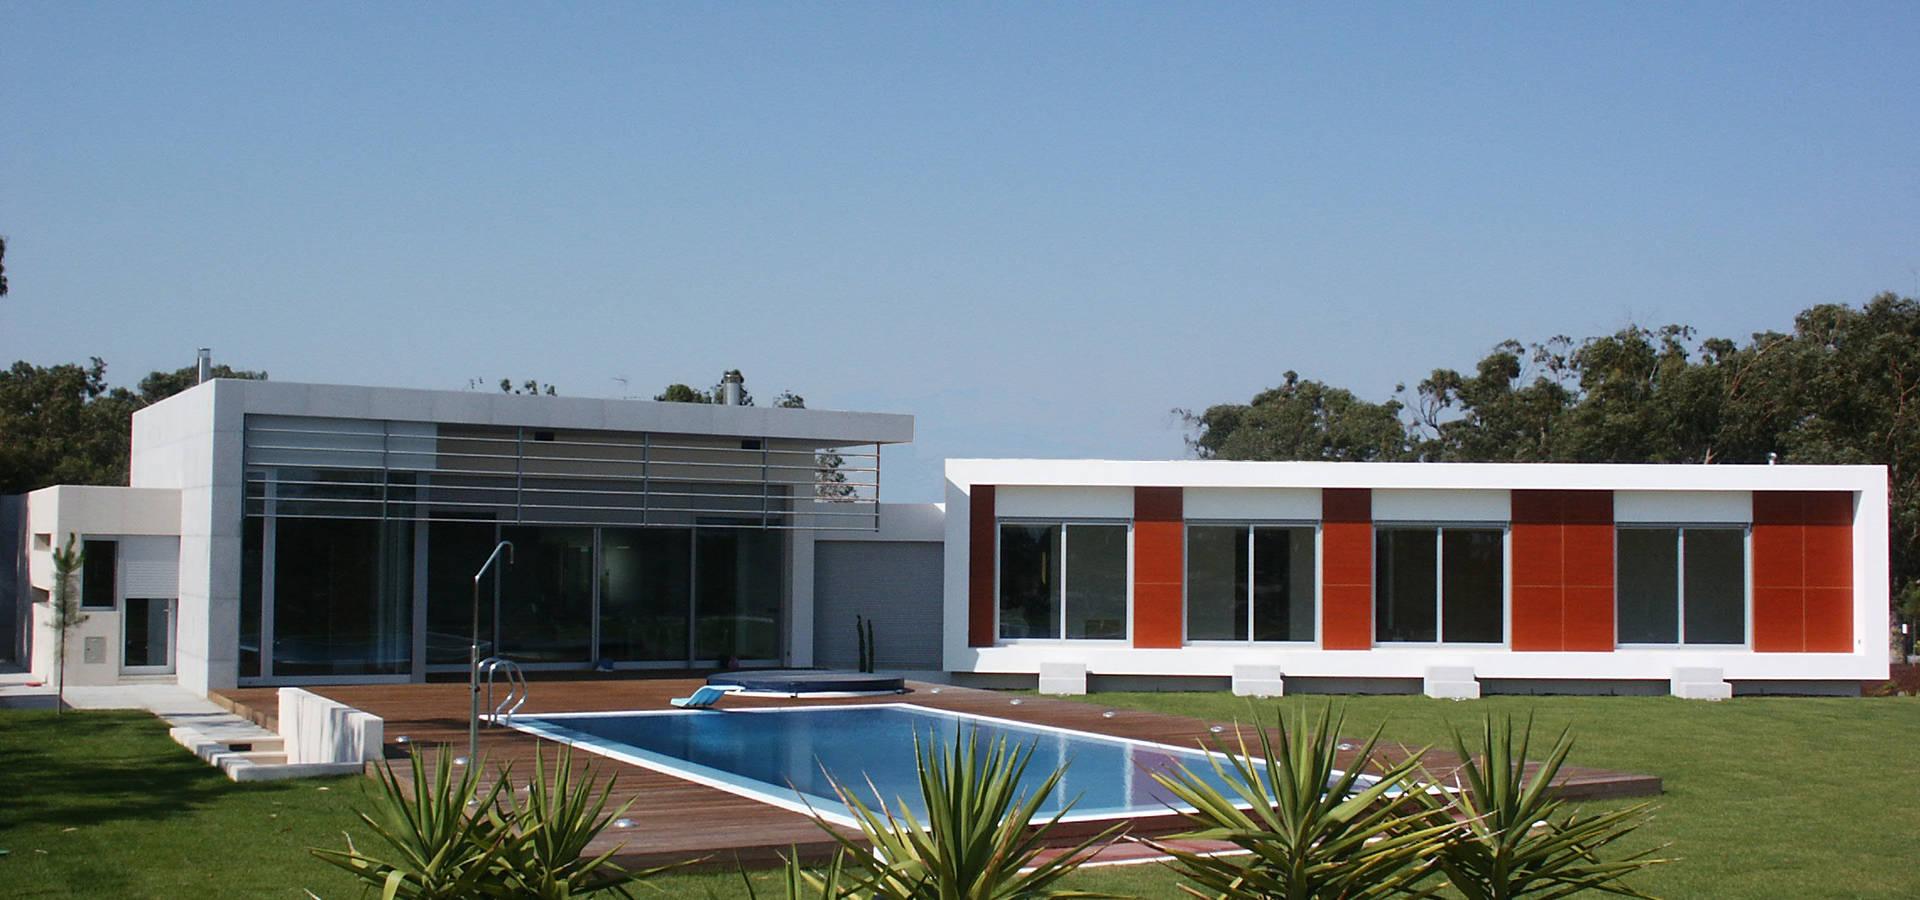 Pardal Monteiro Arquitetos, lda